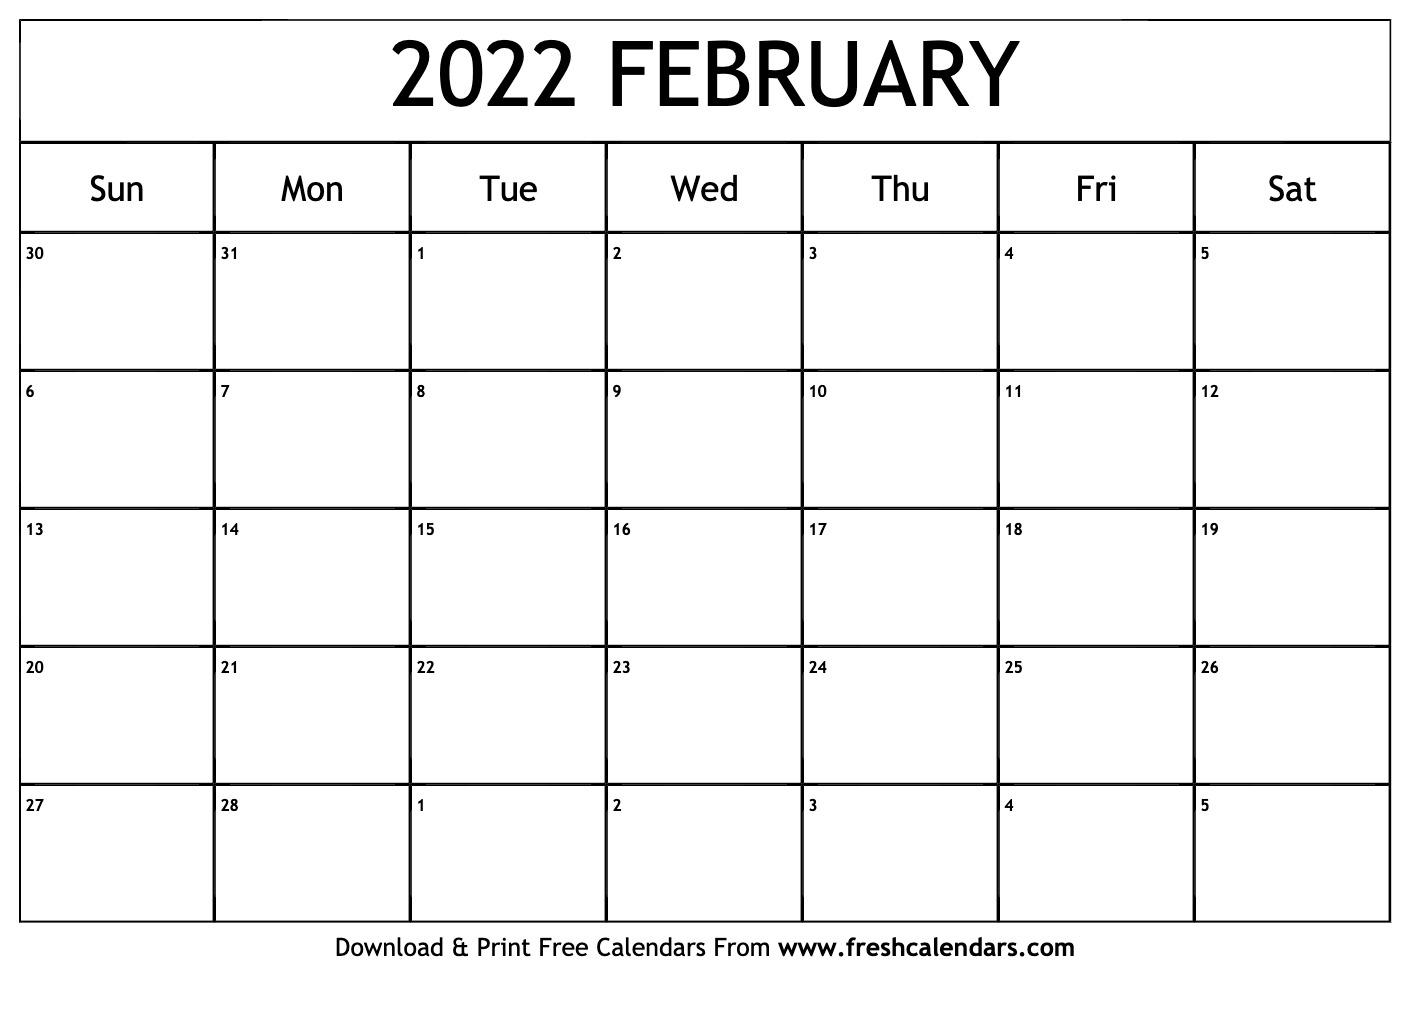 Blank Printable February 2022 Calendars